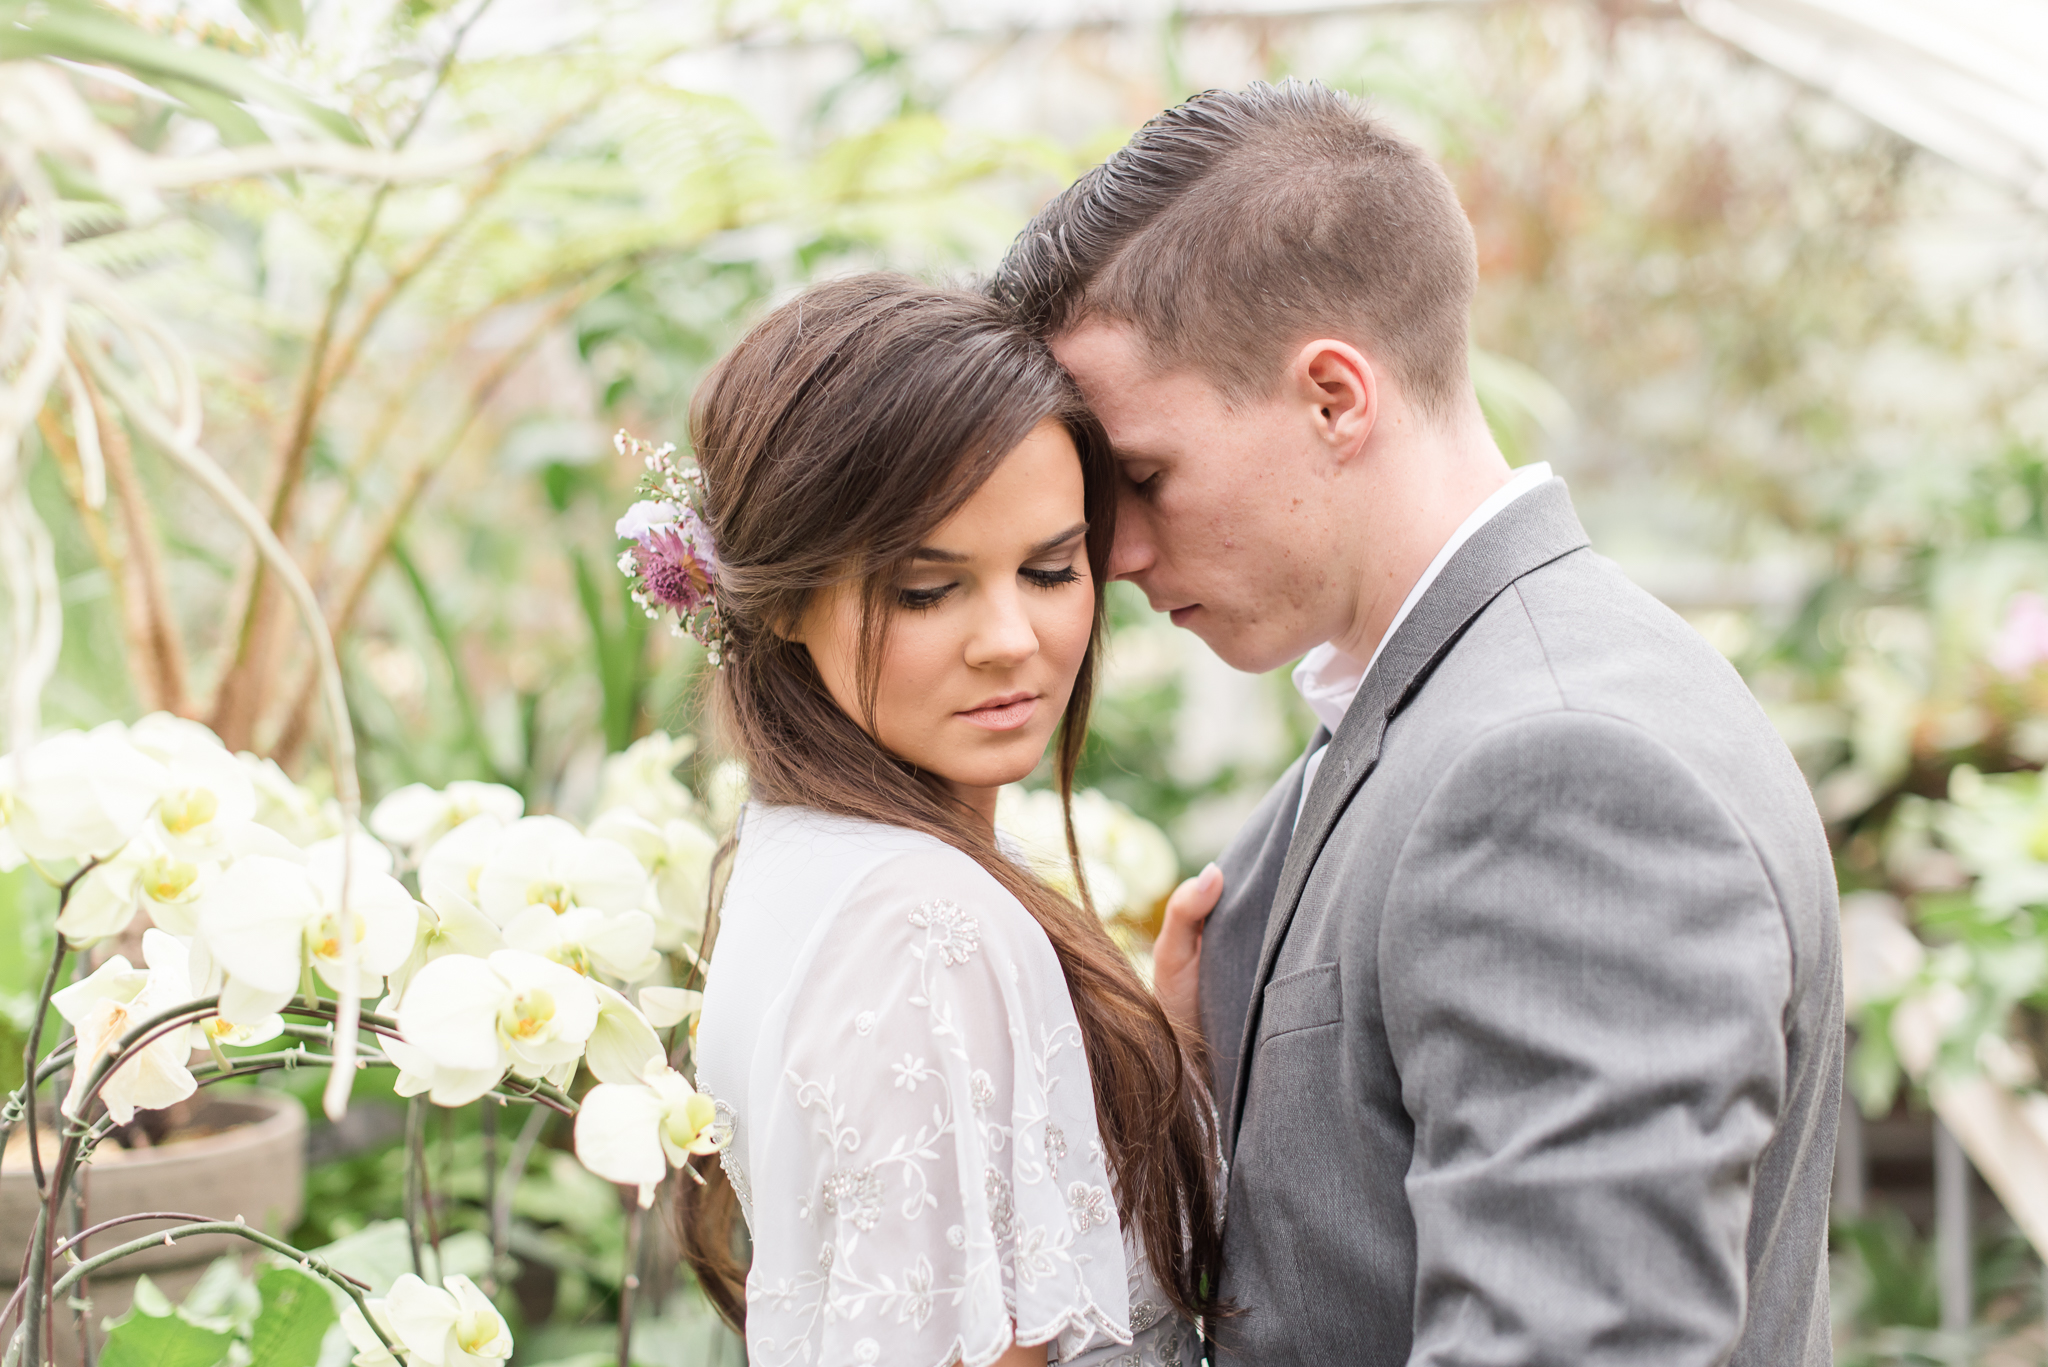 Newfields Engagement Session IMA Indianapolis Museum of Art Wedding Photos Photographer-26.jpg